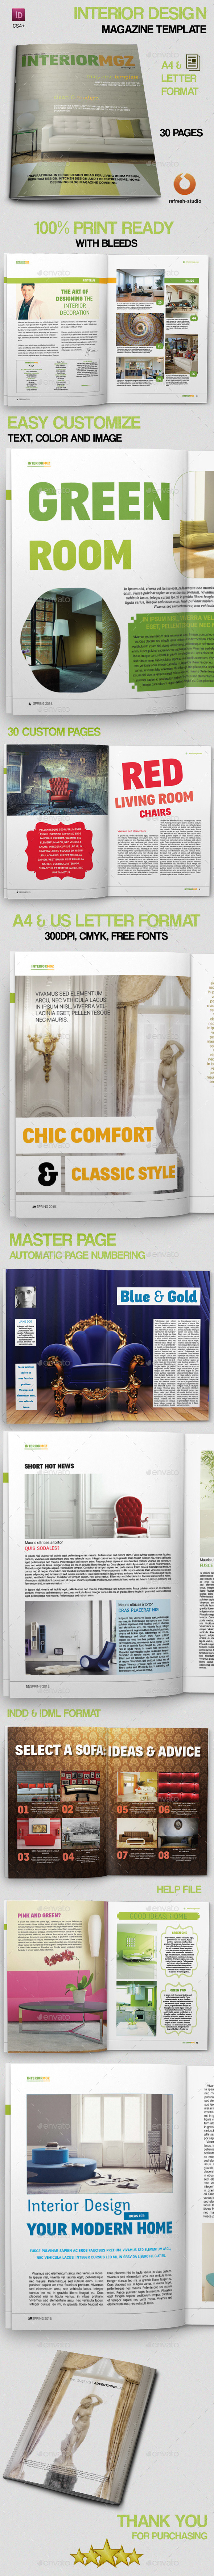 Interior Design Magazine Template - Magazines Print Templates